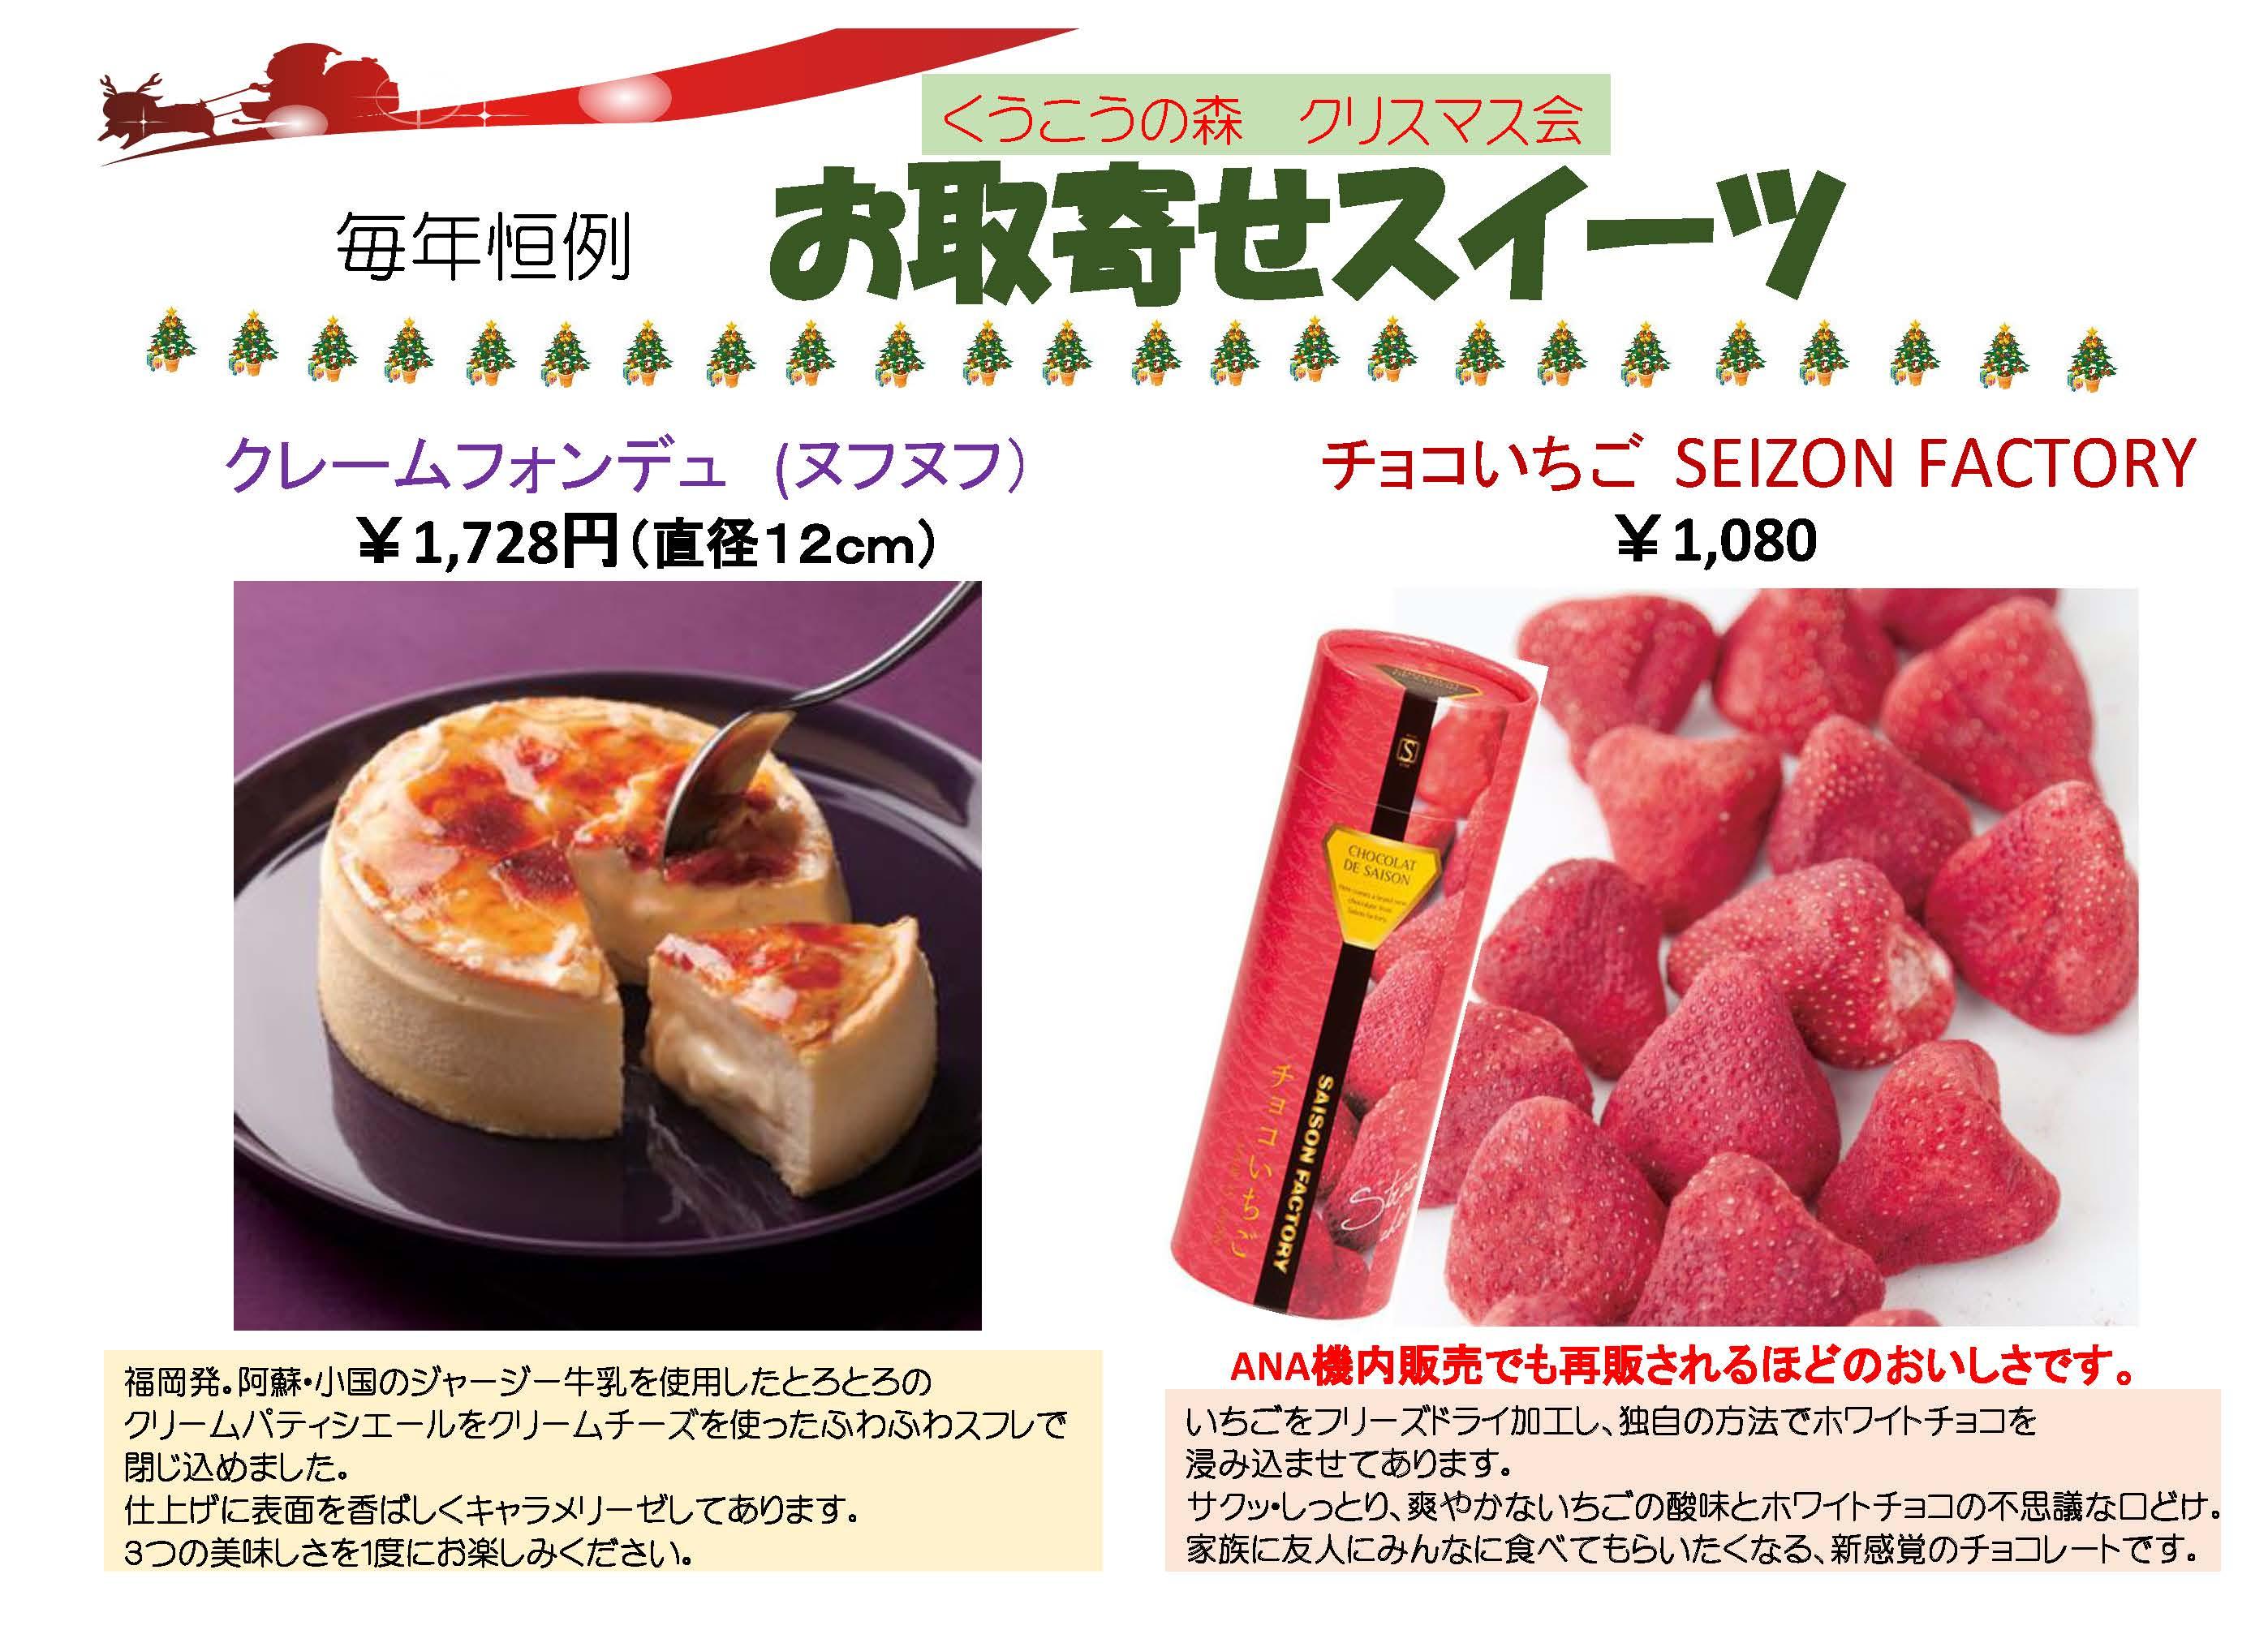 http://www.nakashibetsu-airport.jp/%E3%82%B9%E3%82%A4%E3%83%BC%E3%83%84POP.jpg